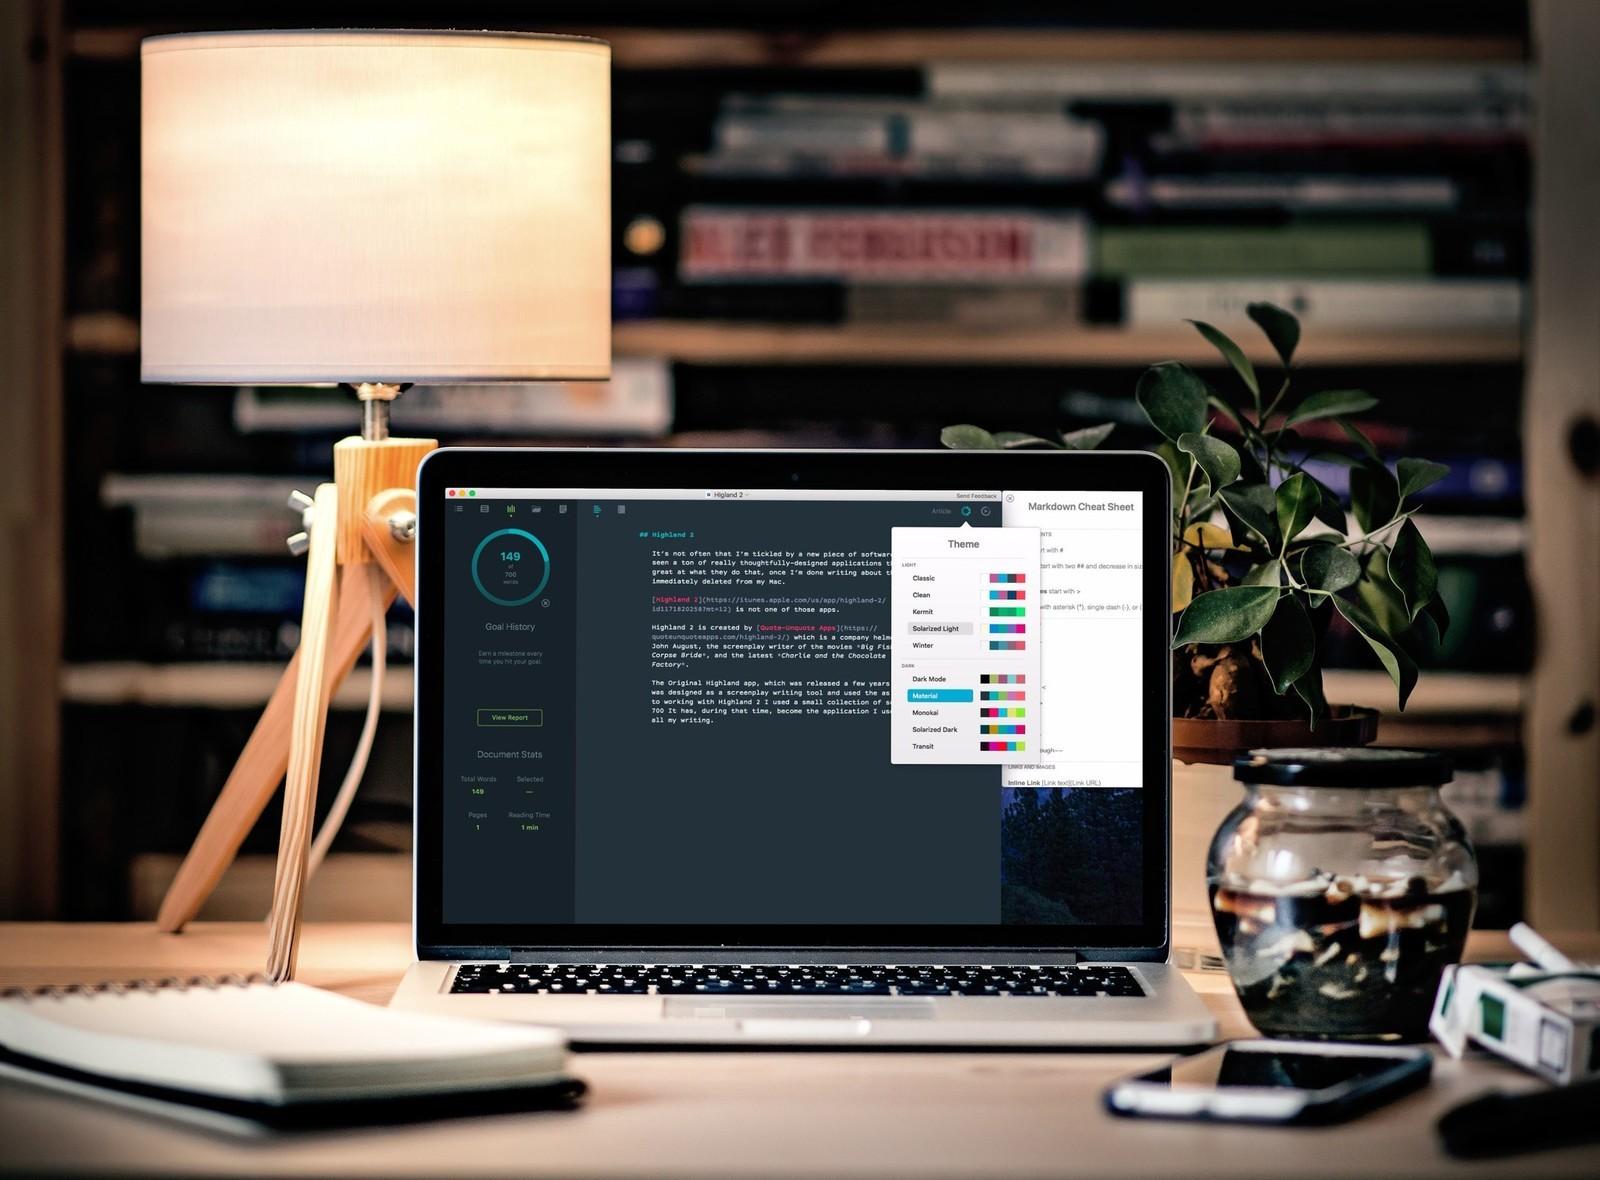 خدمات کامپیوتر تهرانپارس | تعمیر کامپیوتر تهرانپارس | خرید کامپیوتر تهرانپارس | دات نت کامپیوتر